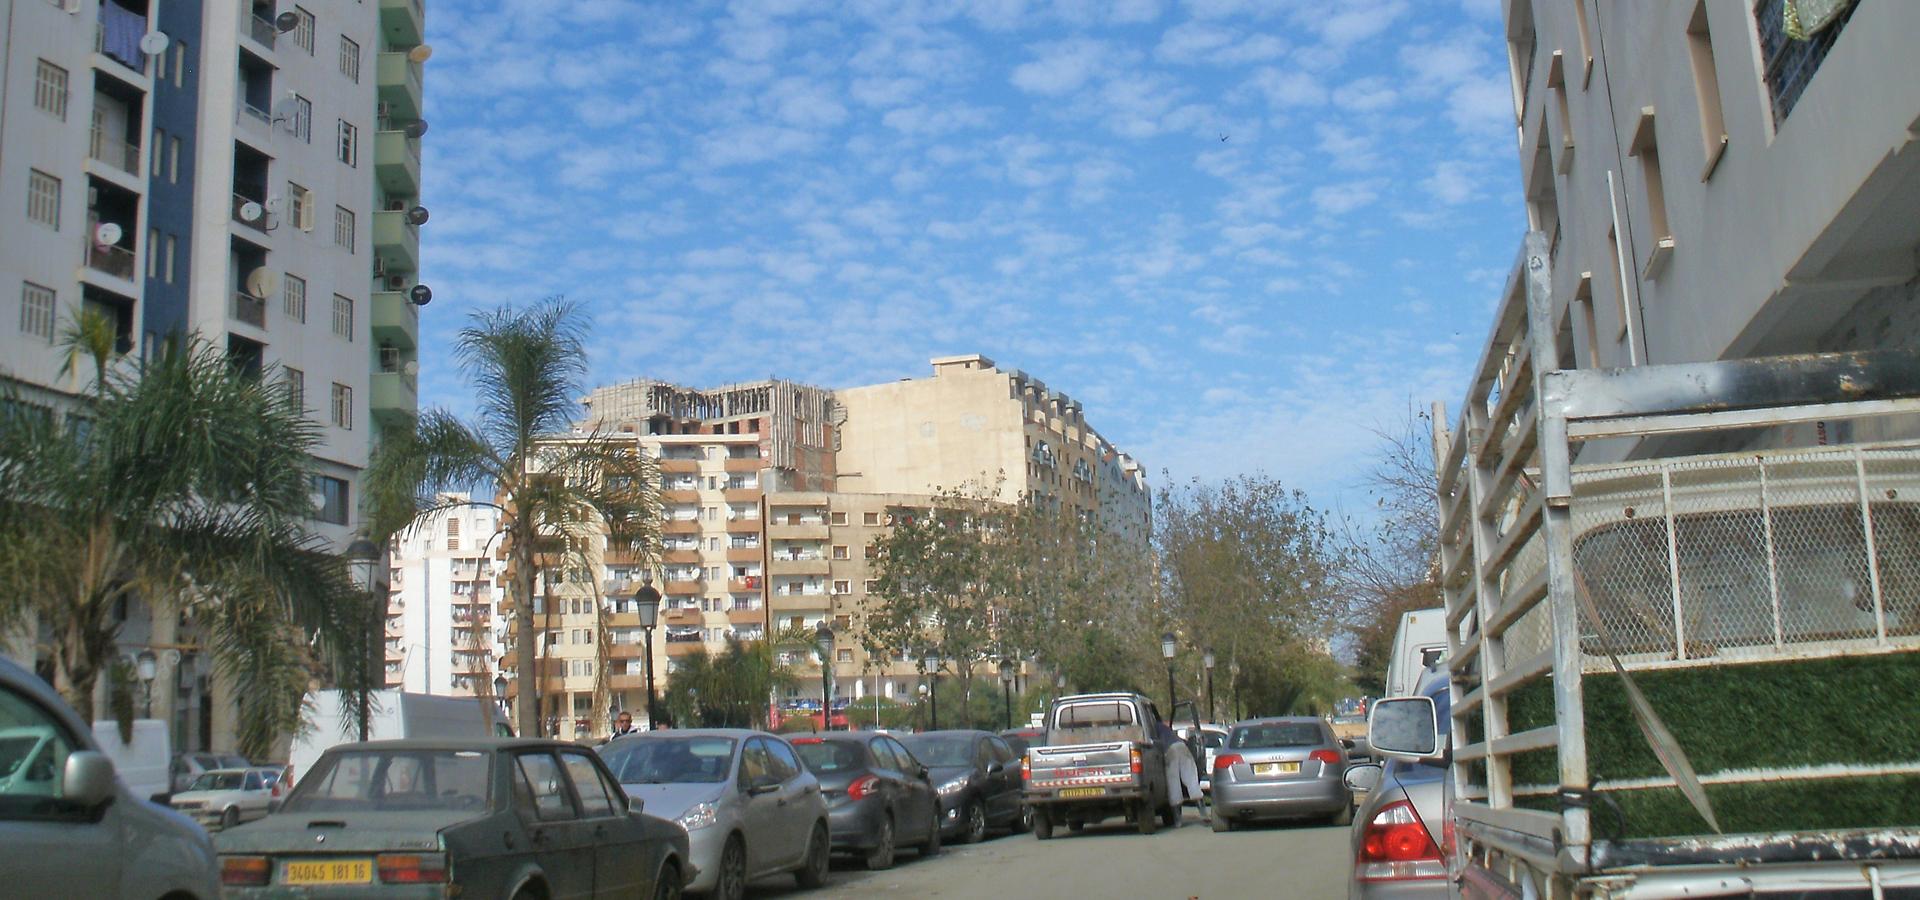 Peer-to-peer advisory in Thenia, Boumerdès Province, Algeria